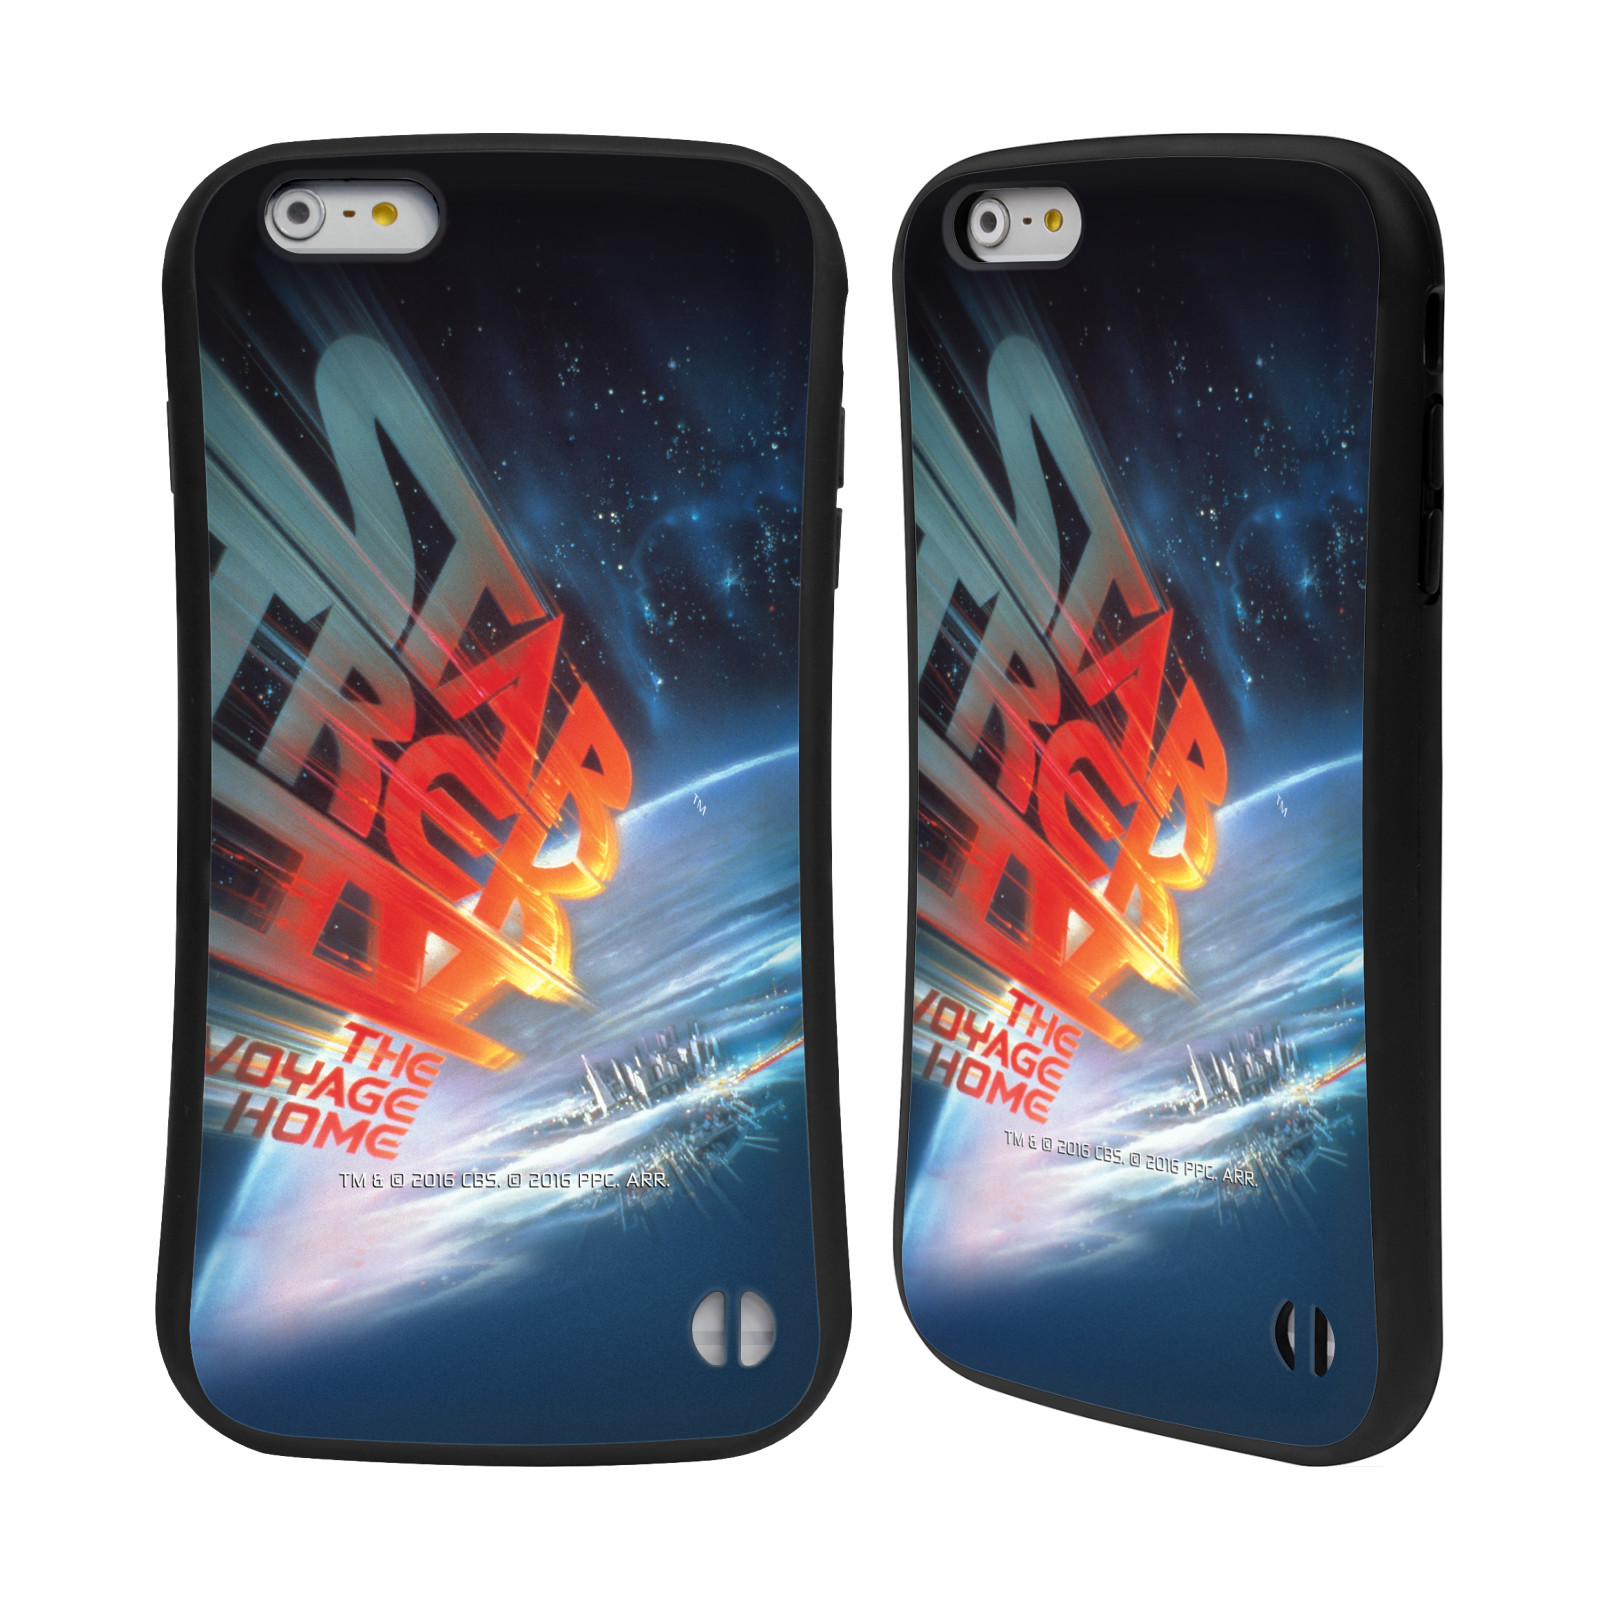 HEAD CASE silikon/plast odolný obal na mobil Apple Iphone 6 PLUS / 6S PLUS Star Trek Filmové plakáty Cesta domů